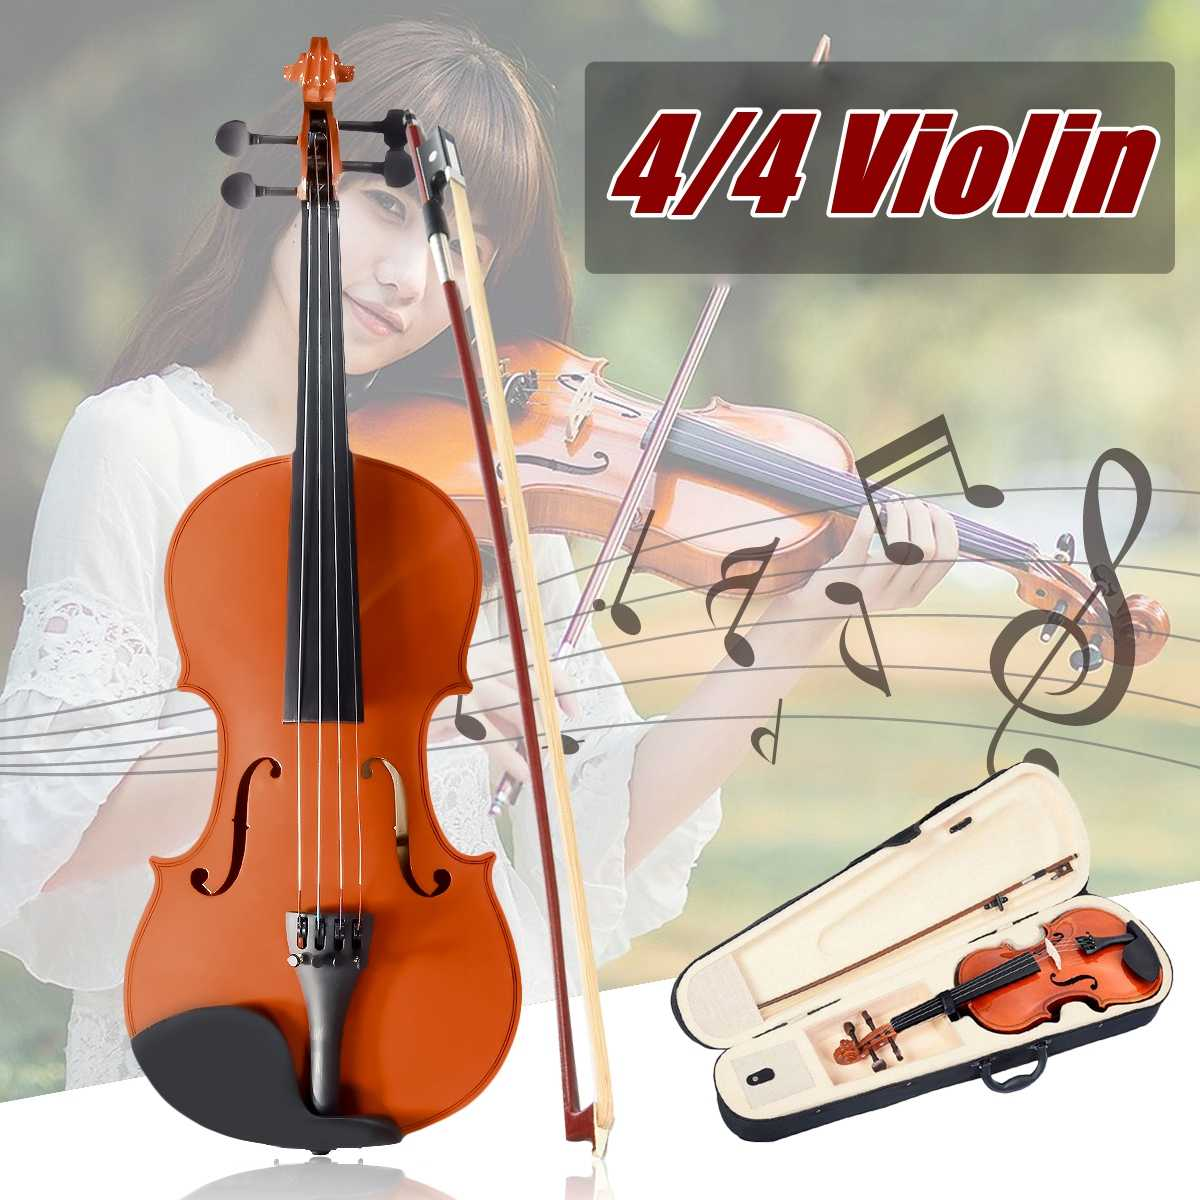 Violin Parts & Accessories 4/4 Violin Blank Maple With Ebony Fingerboard Unfinished Violin For 4/4 Diy Violin Accessories